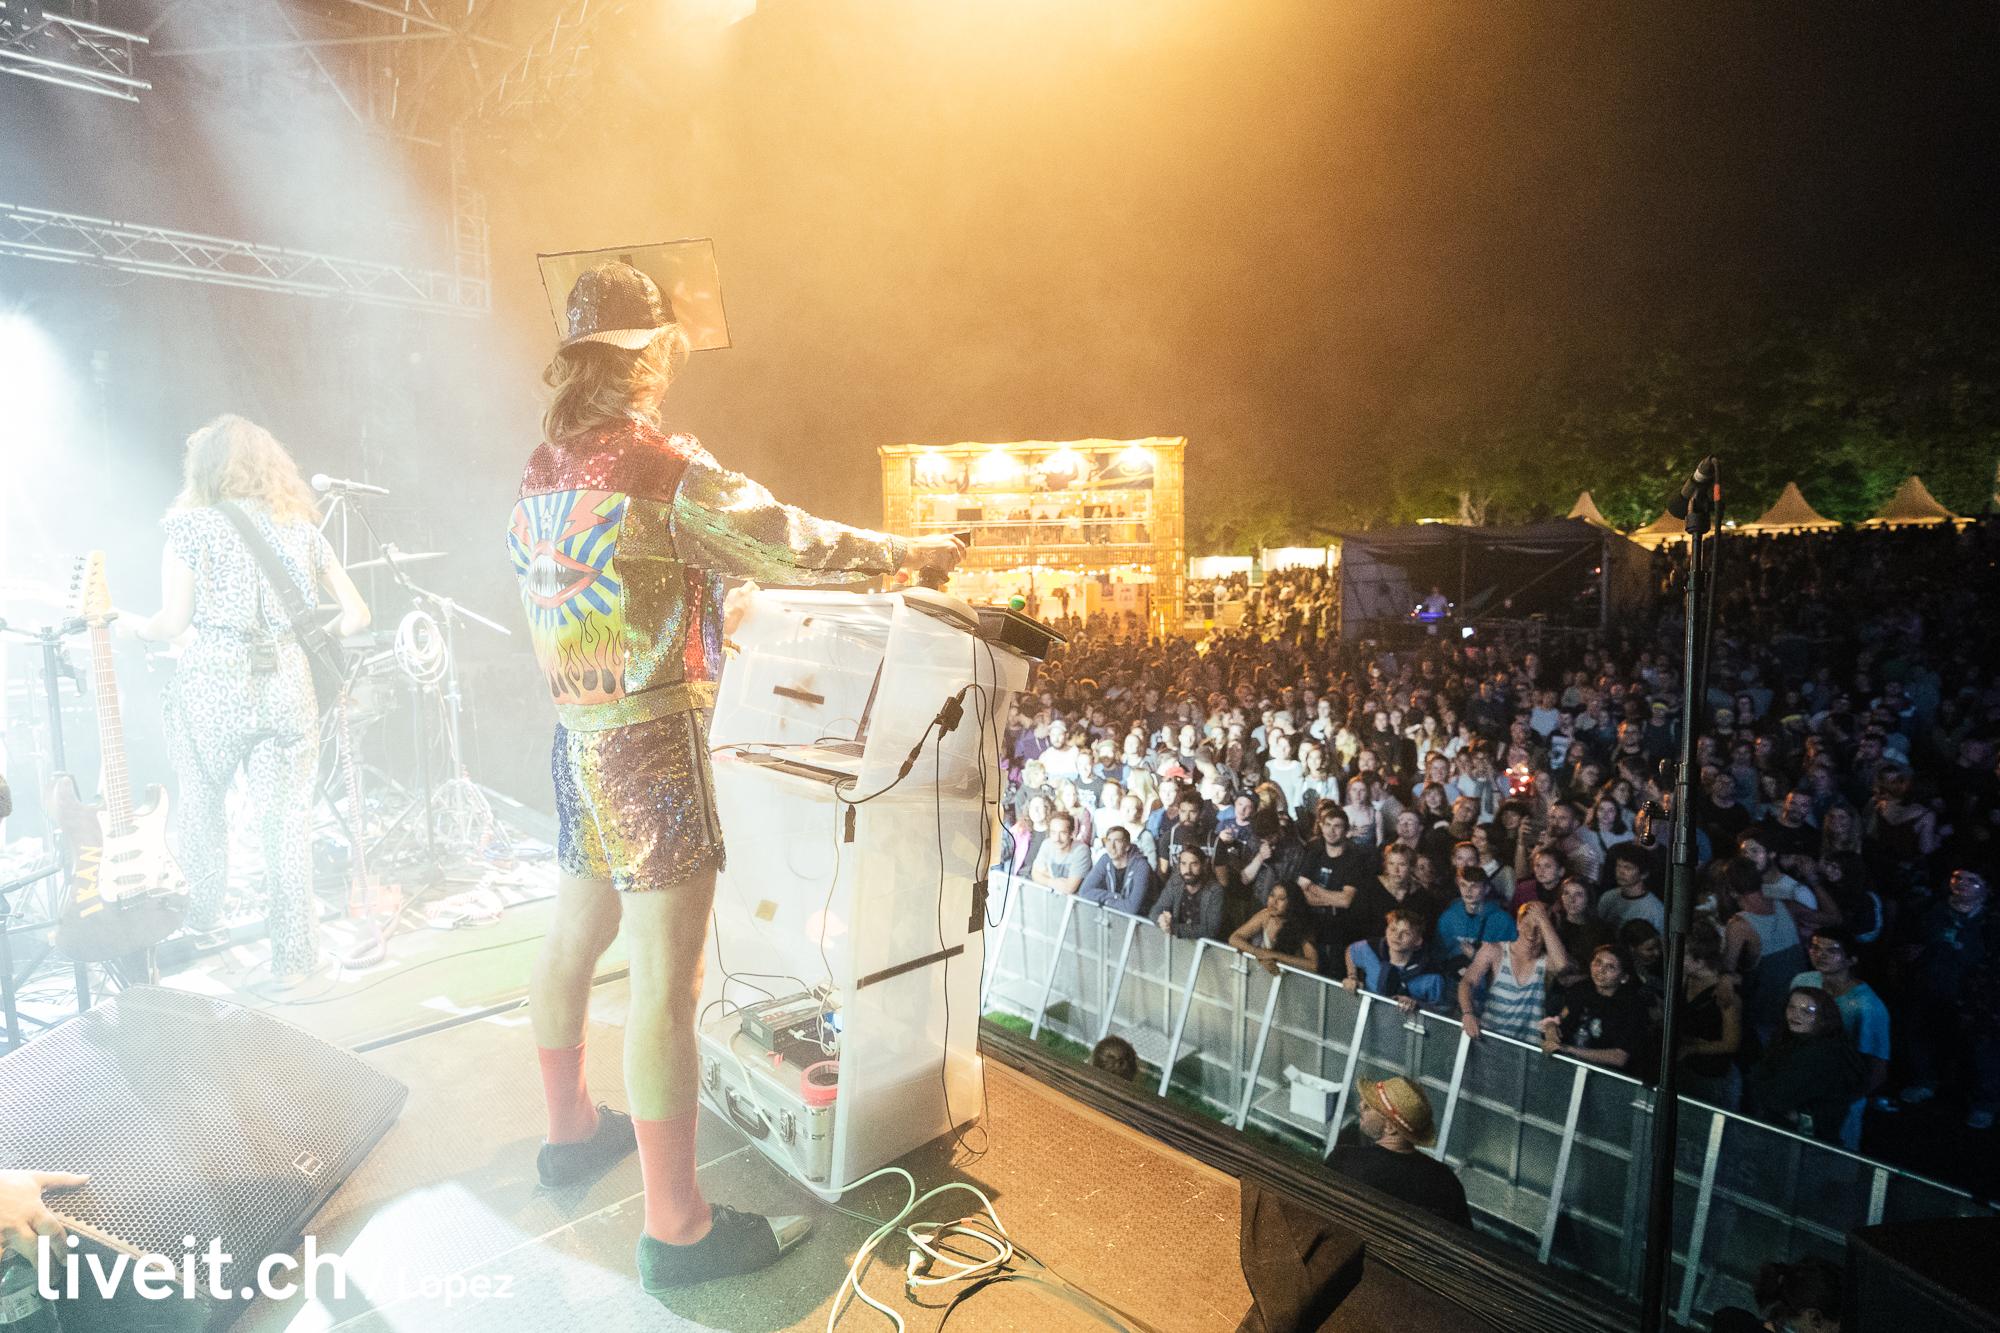 Ikan Hay am Gurtenfestival 2019